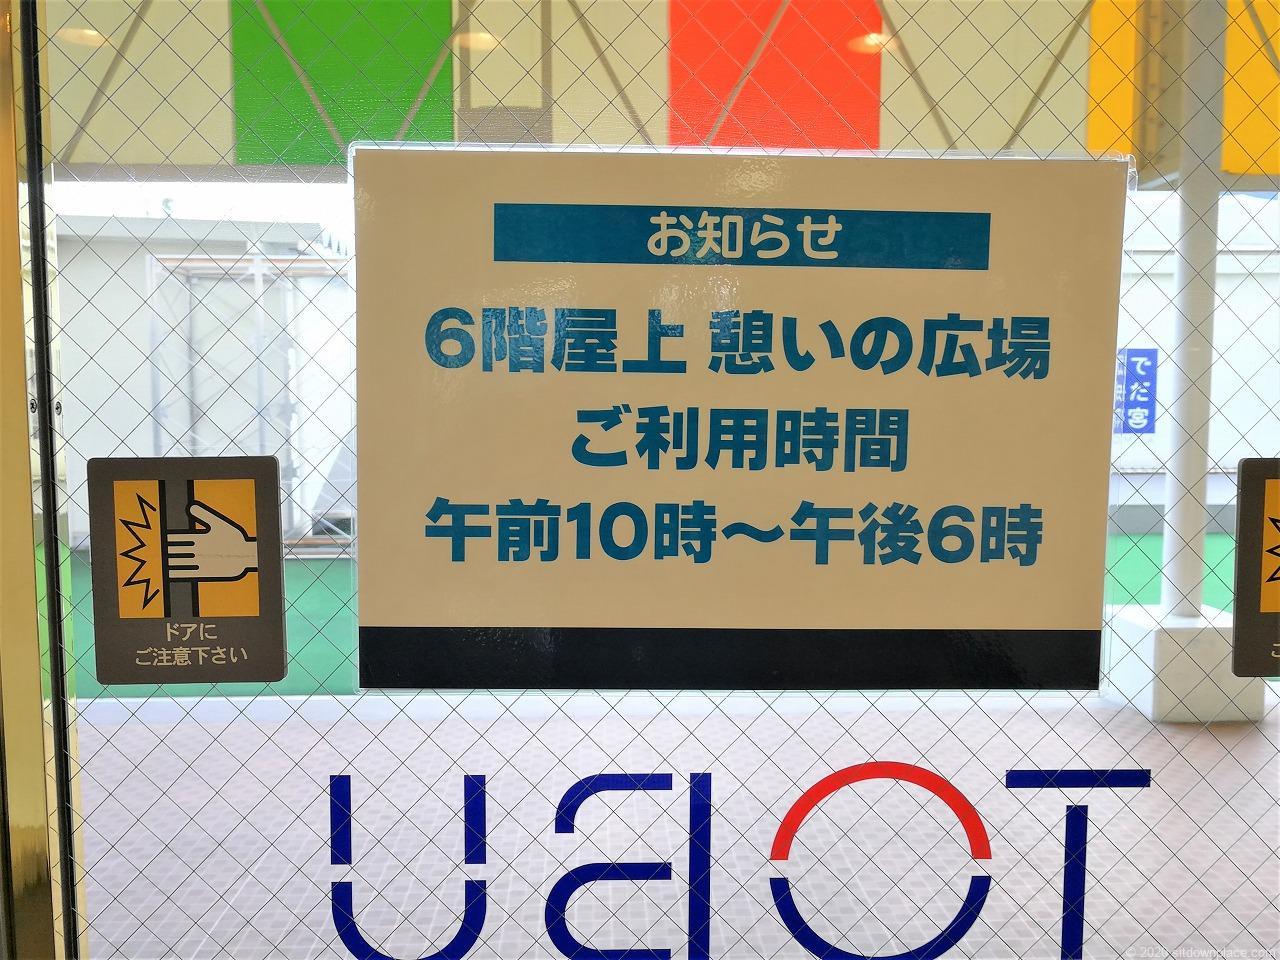 東武宇都宮駅 東武6F 屋上憩いの広場の営業時間案内